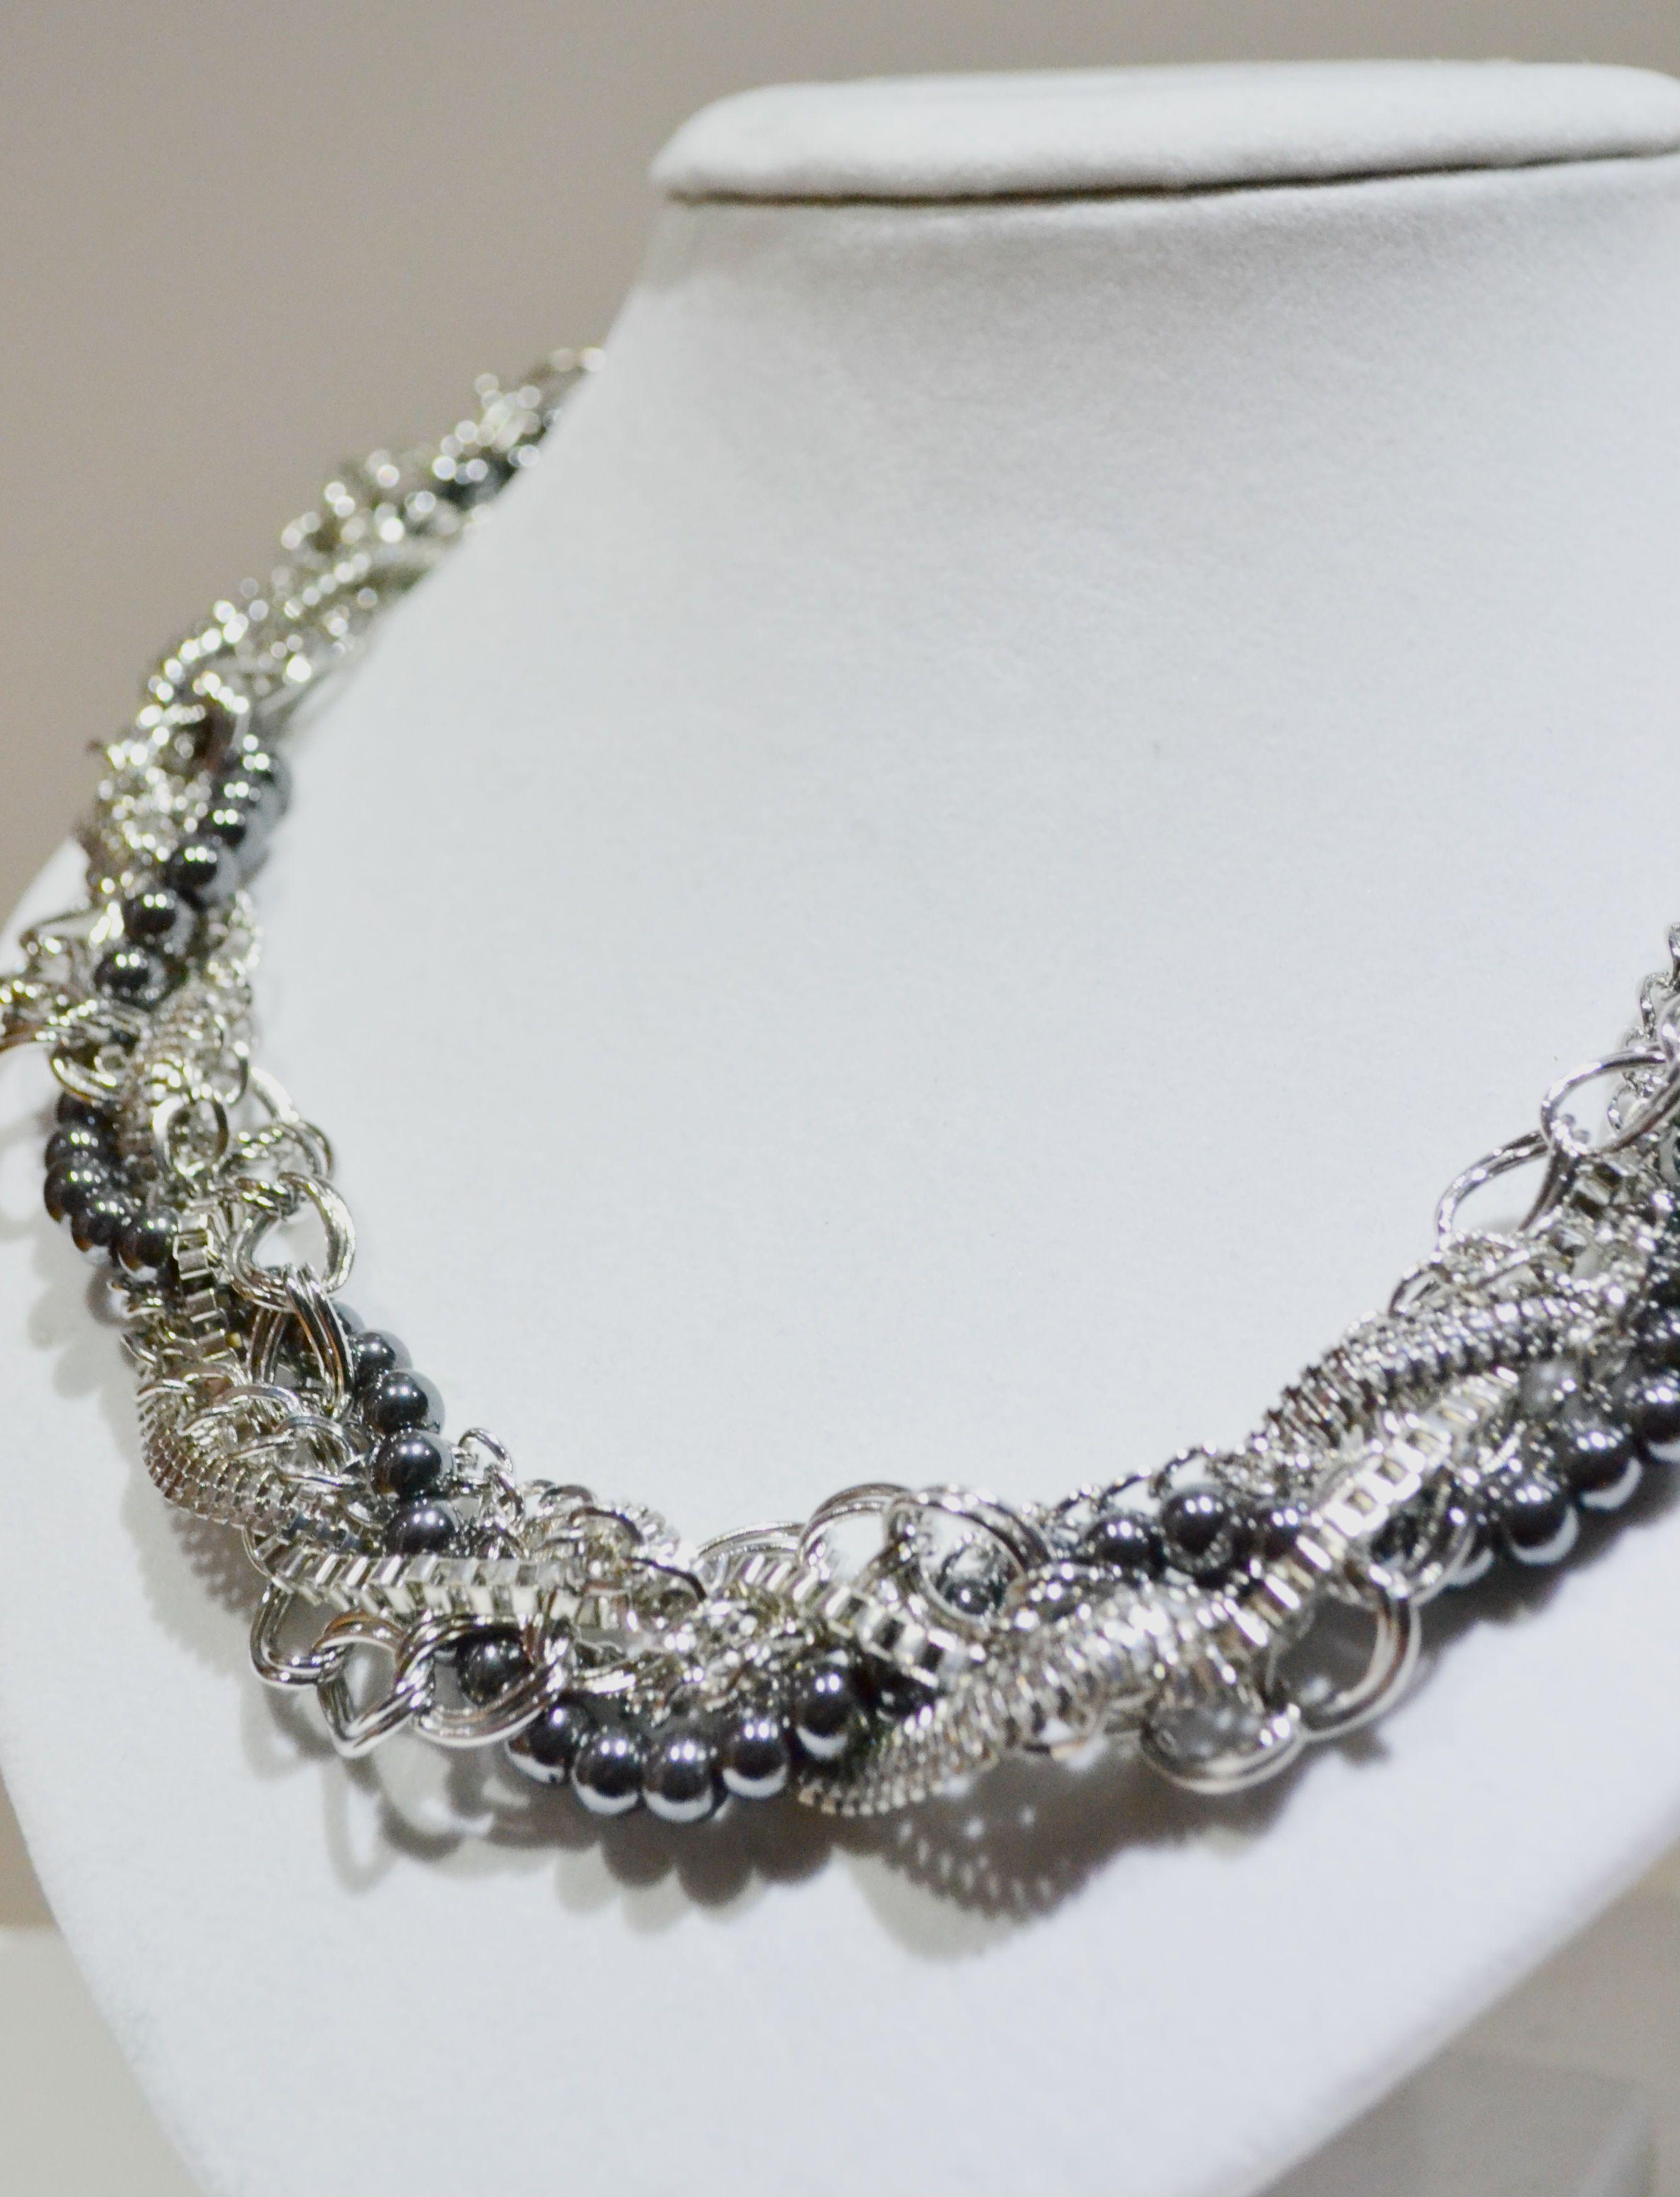 Collar señora statement perlas joyas cadena 4 modelos Design